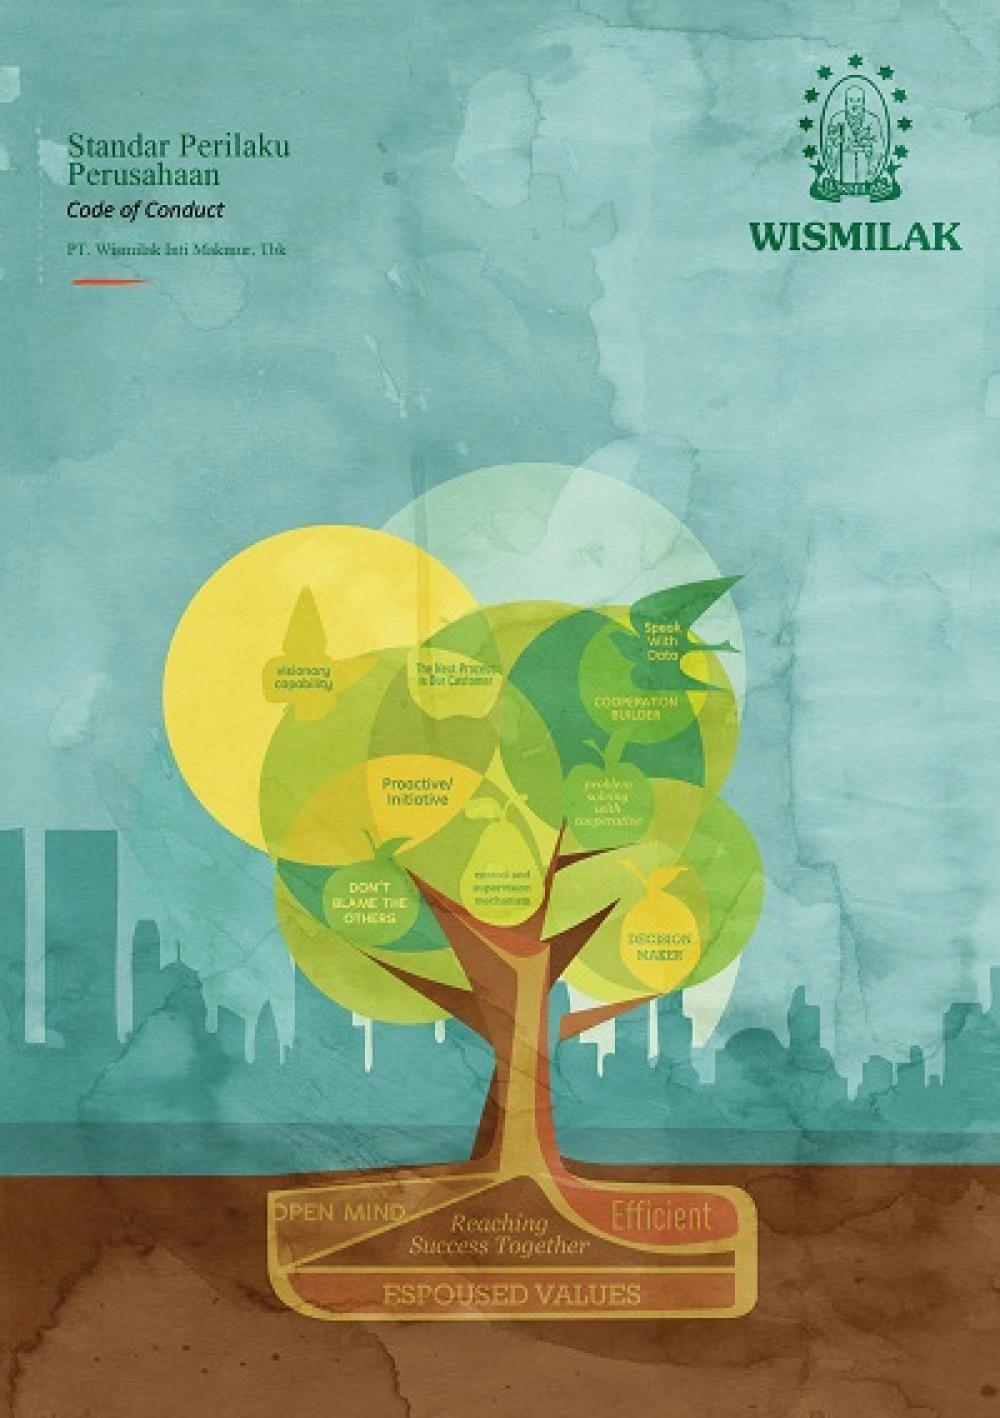 Investor Information Wismilak Group Corporate Behavior System